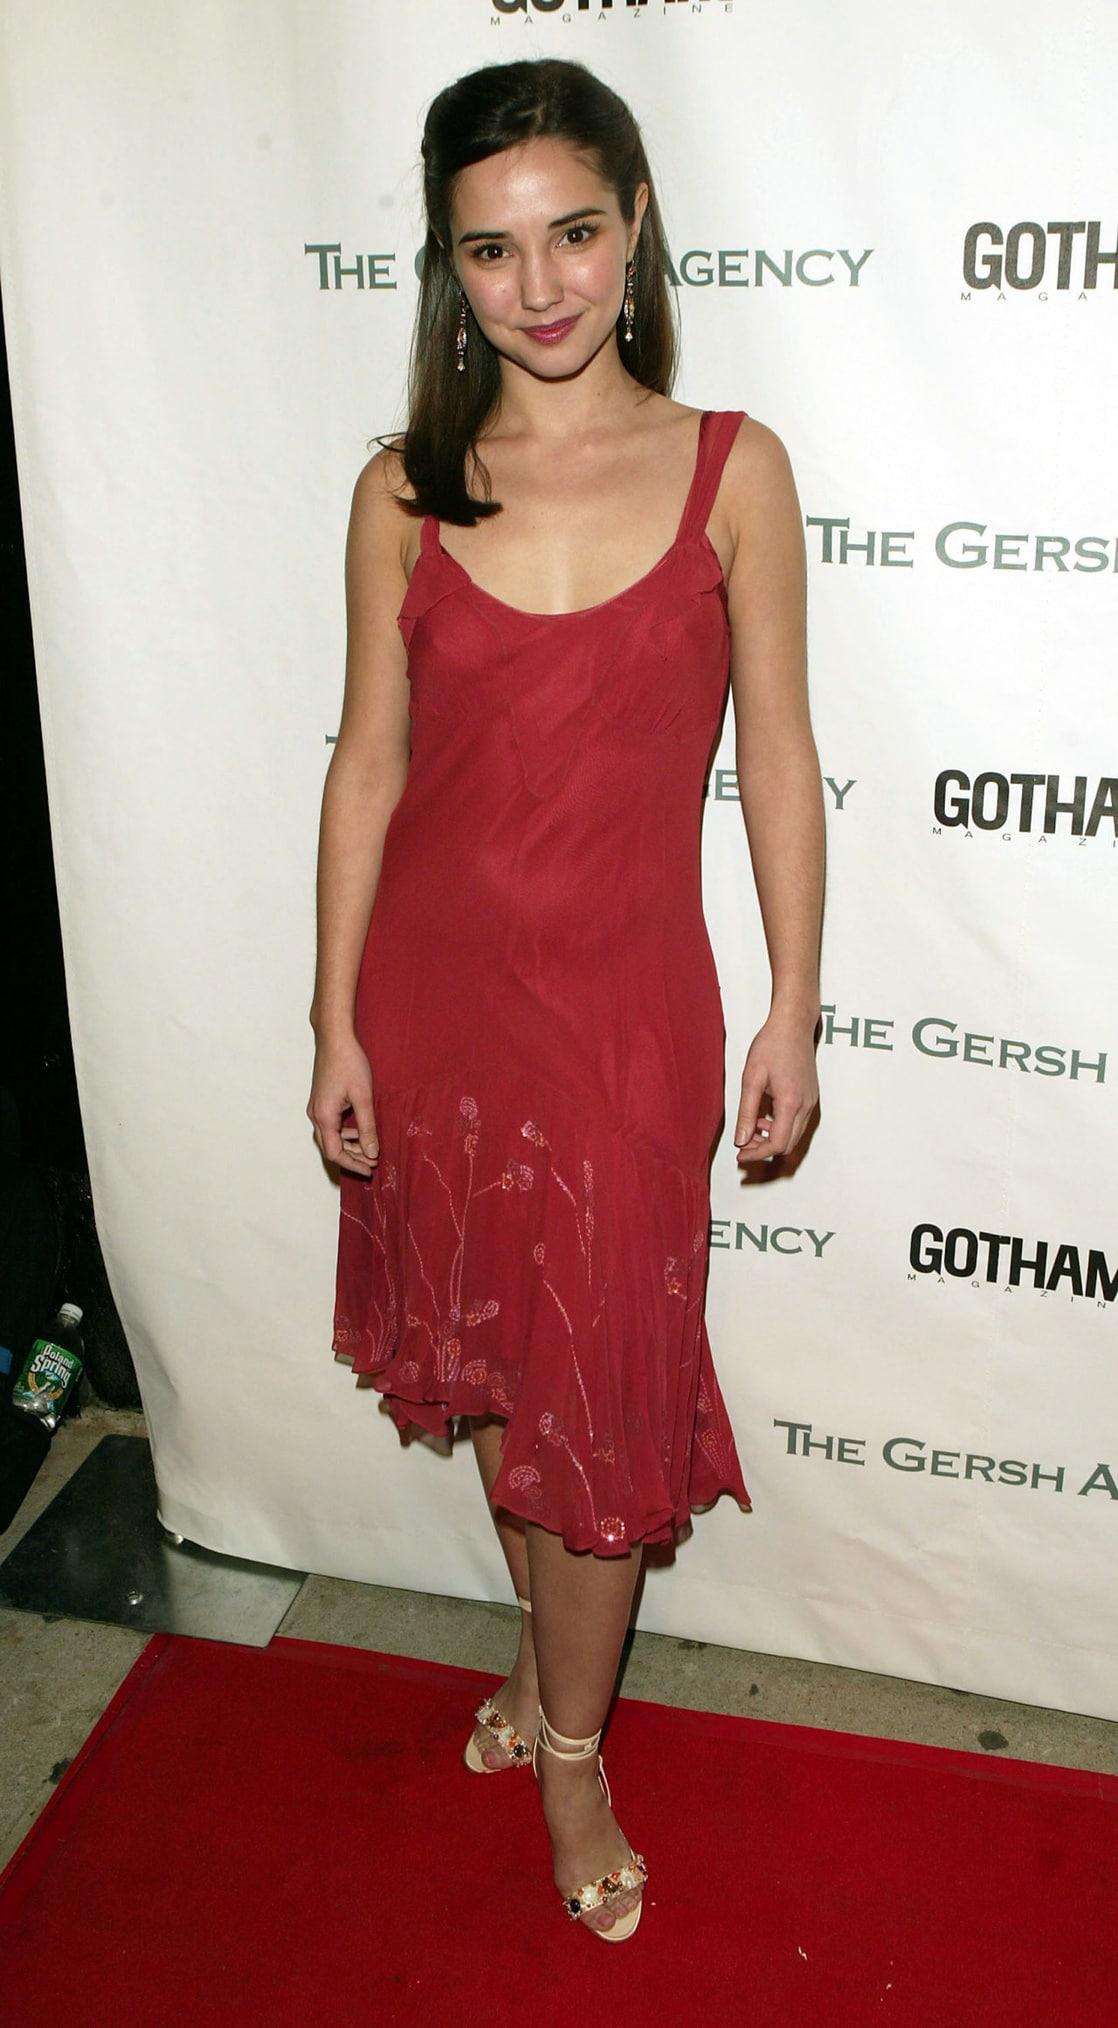 Larisa Oleynik born June 7, 1981 (age 37),Mary-Louise Parker Sex archive Cassandra Peterson,Pilar Pilapil (b. 1950)